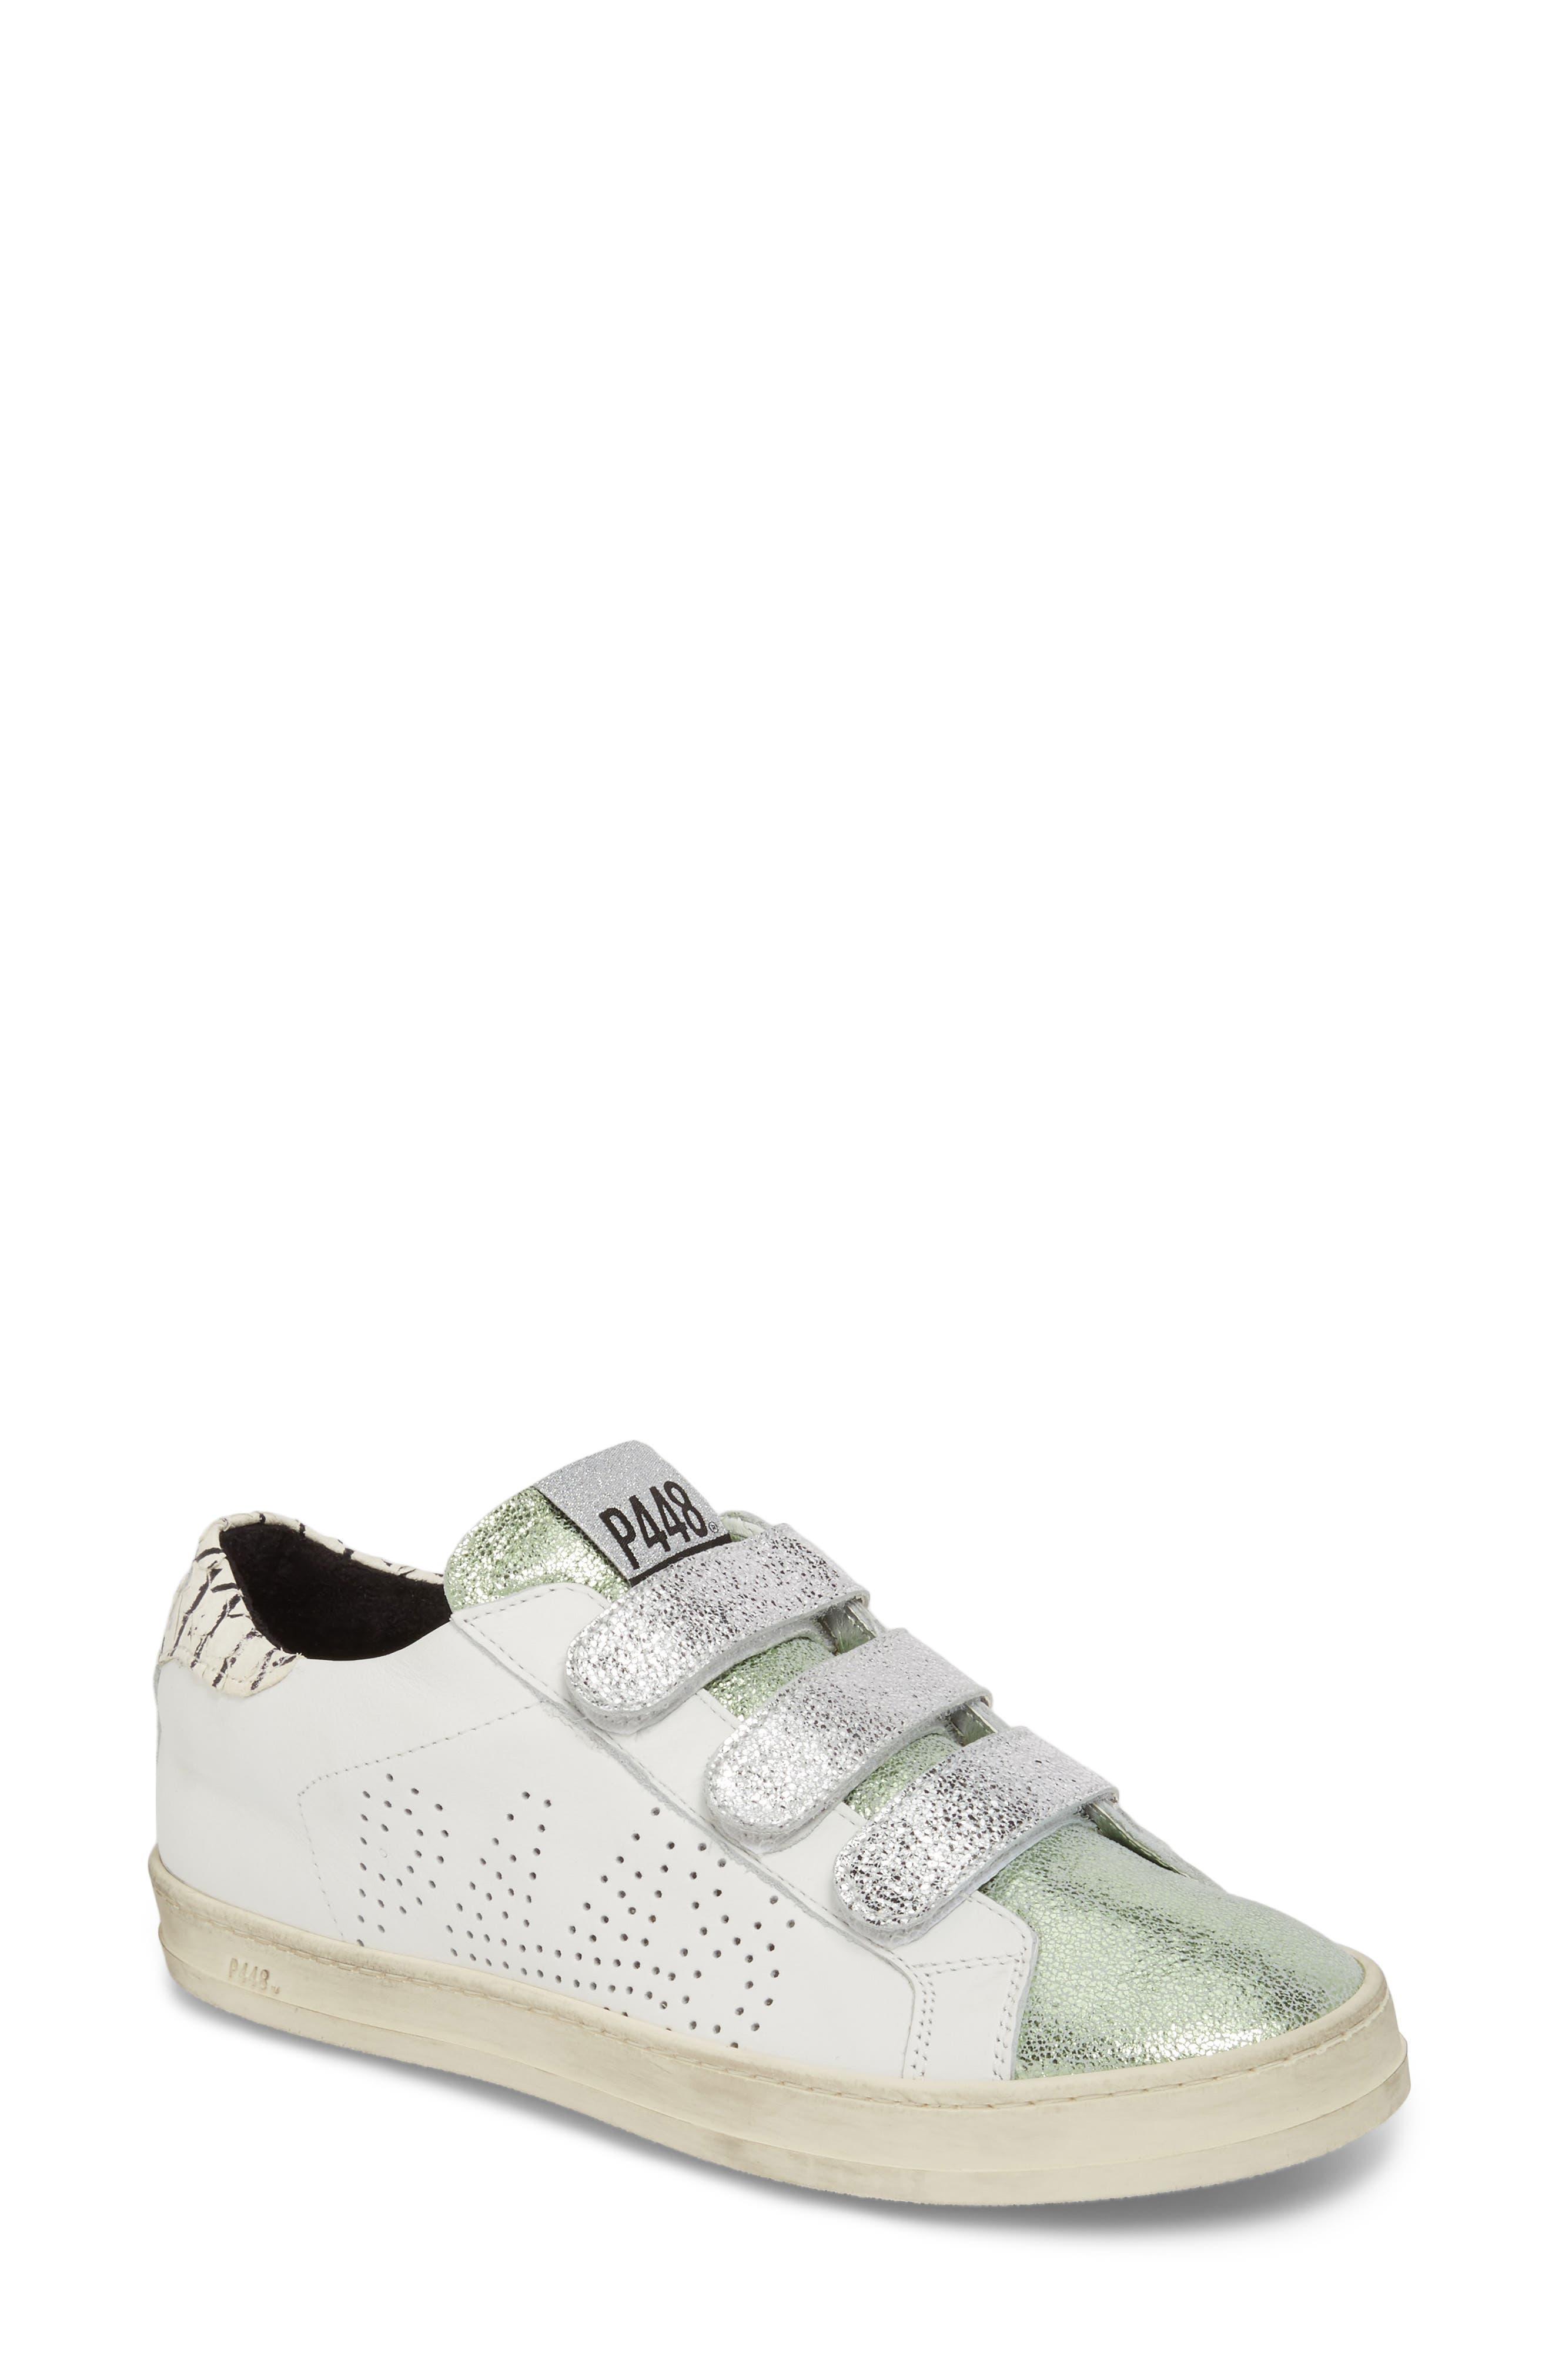 Ralph Sneaker, Green